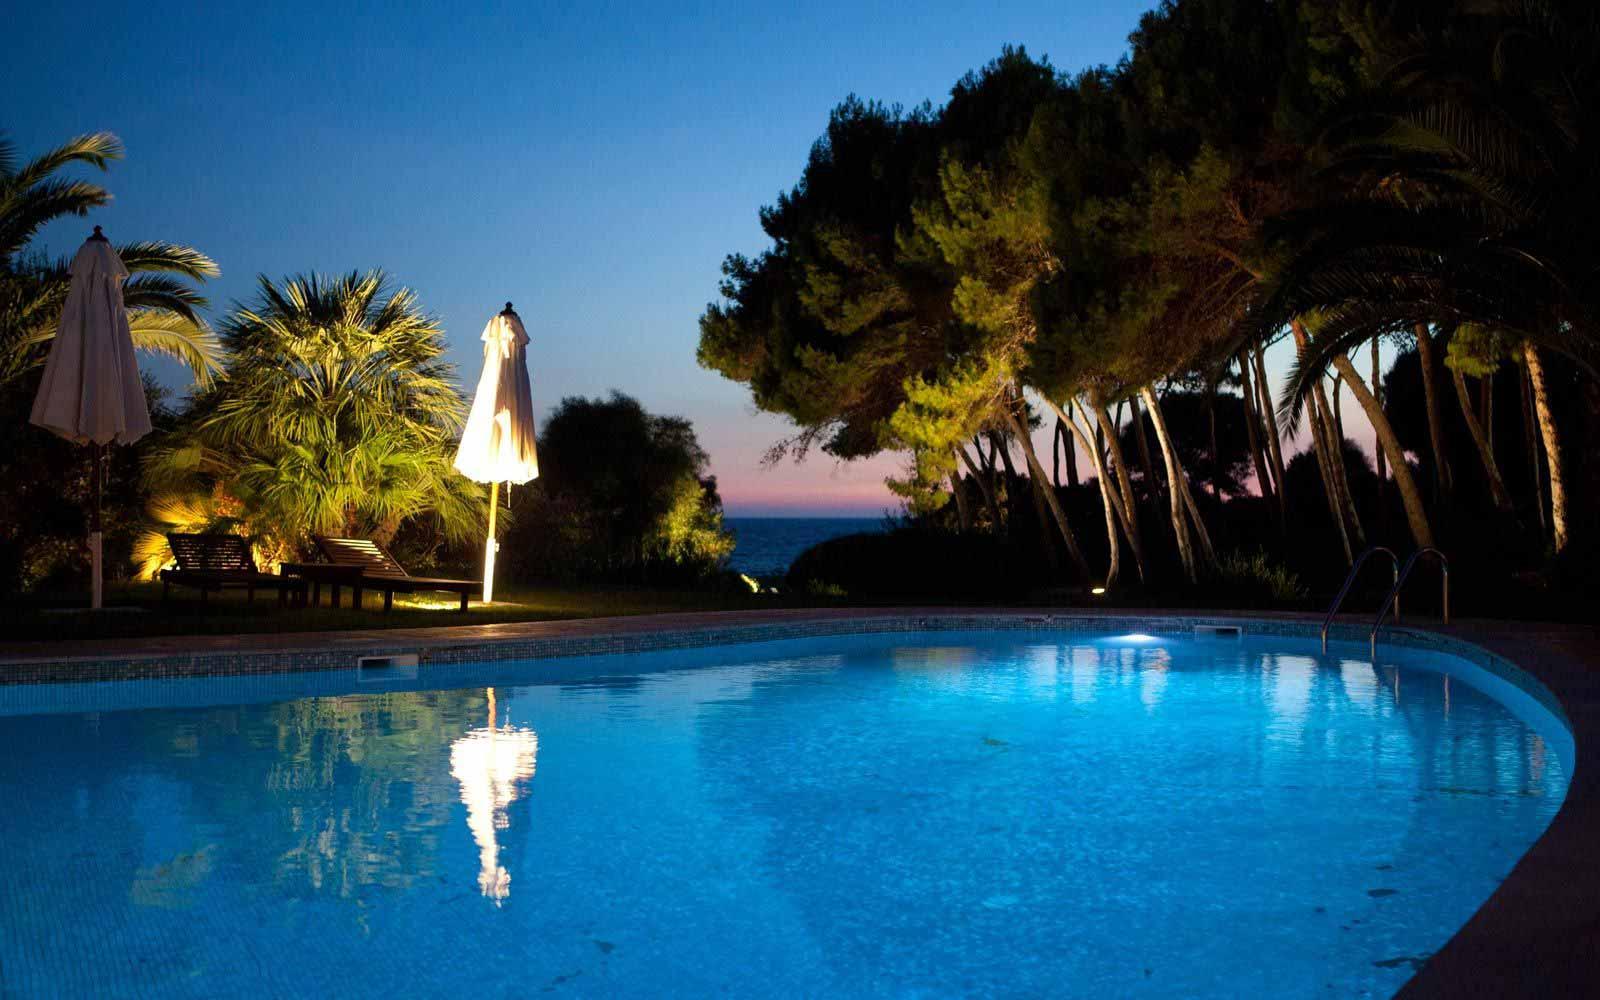 Swimming pool at night Hotel Cala Caterina